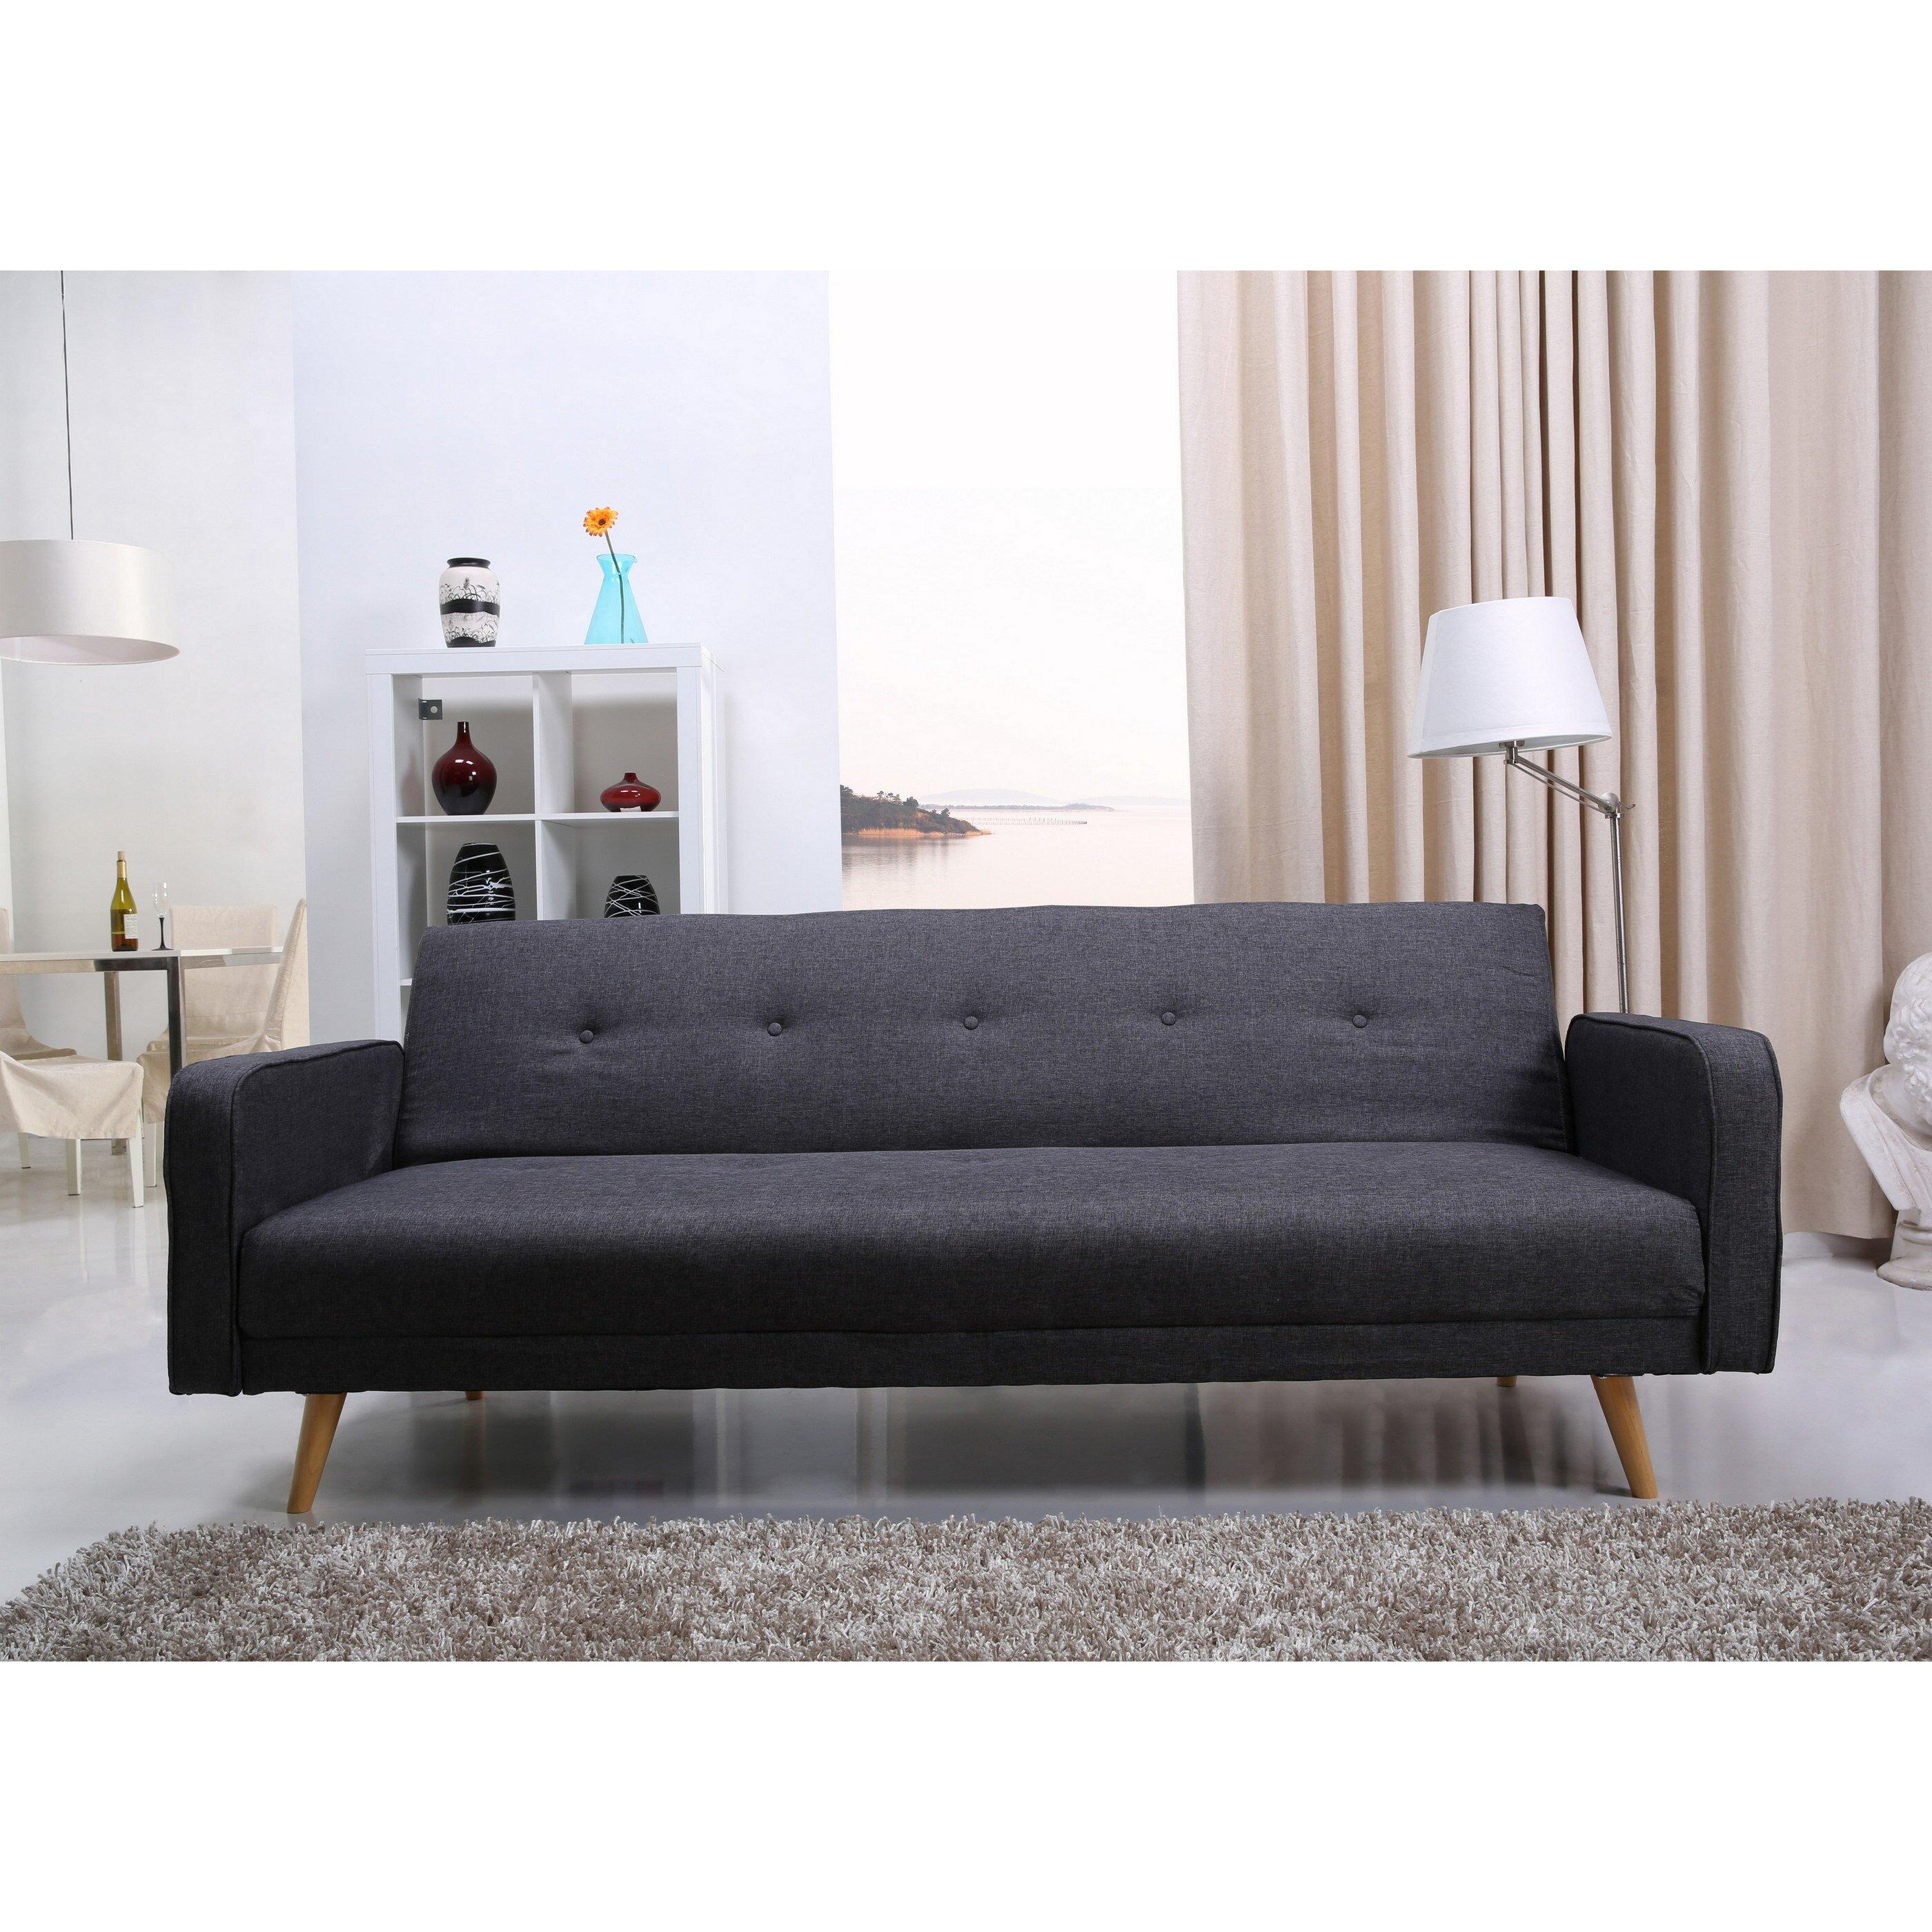 Mercury Row Patro 3 Seater Clic Clac Sofa Bed Reviews